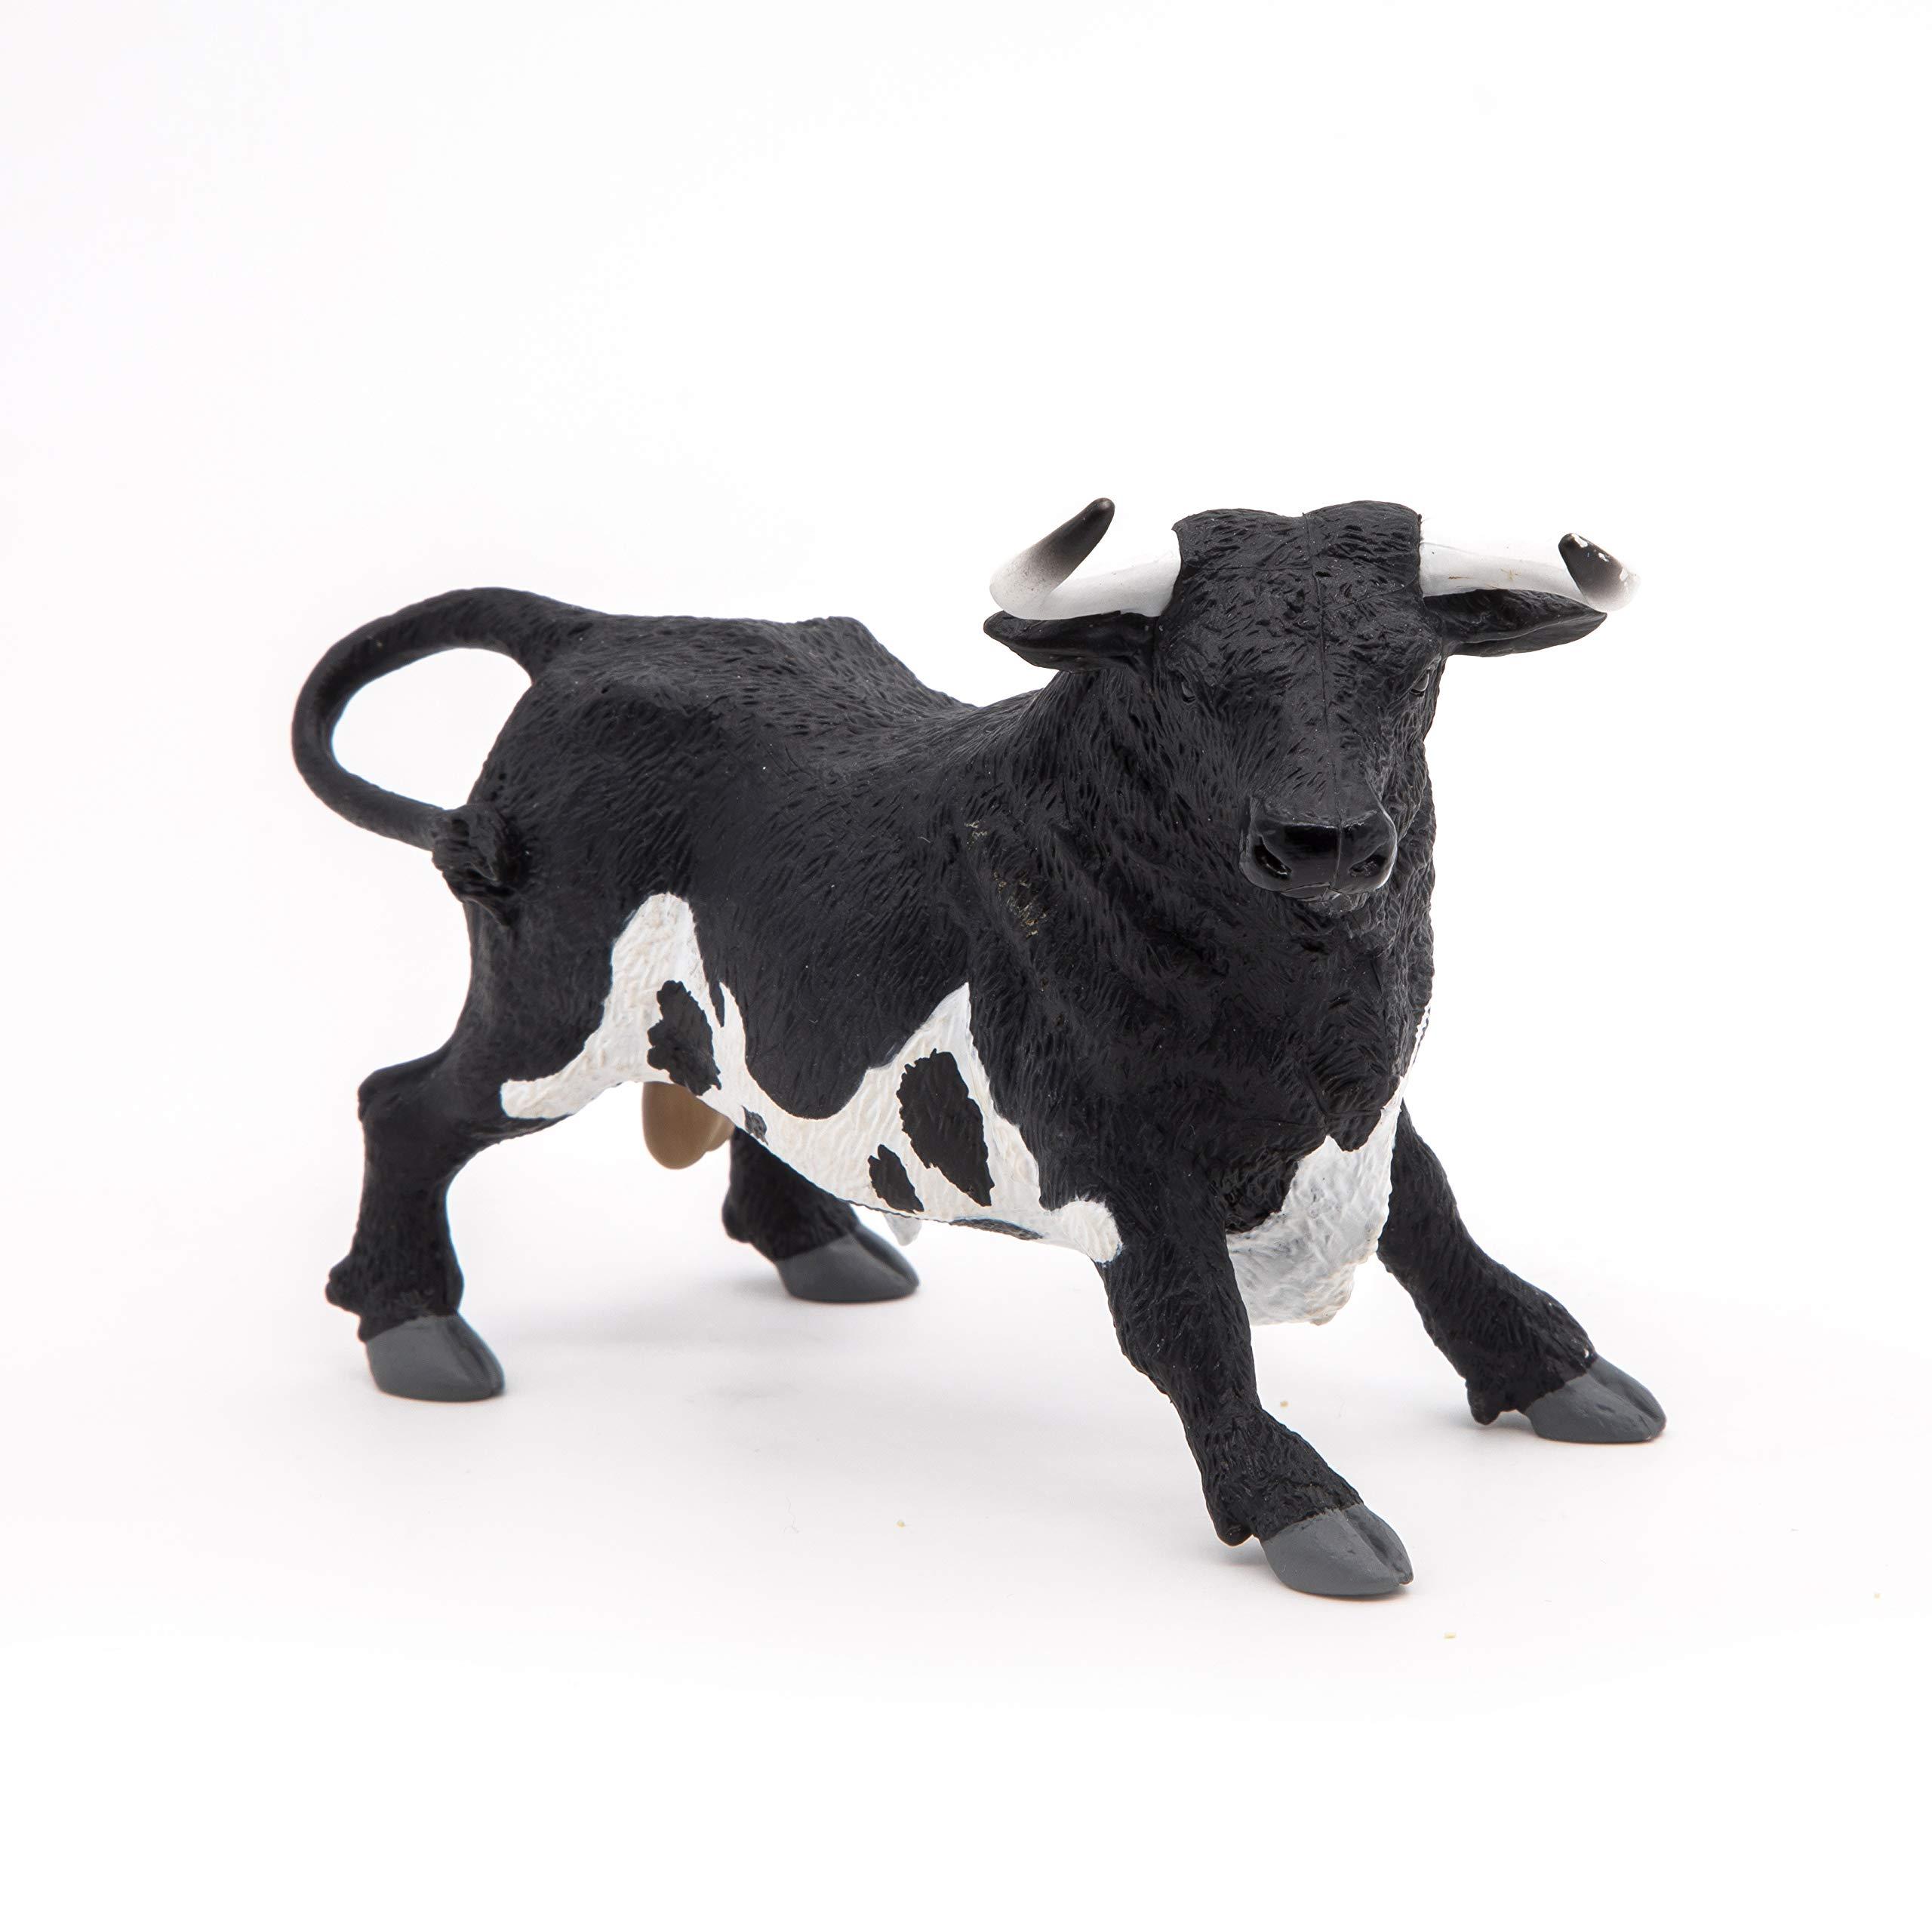 Papo Spanish Bull Toy Figure